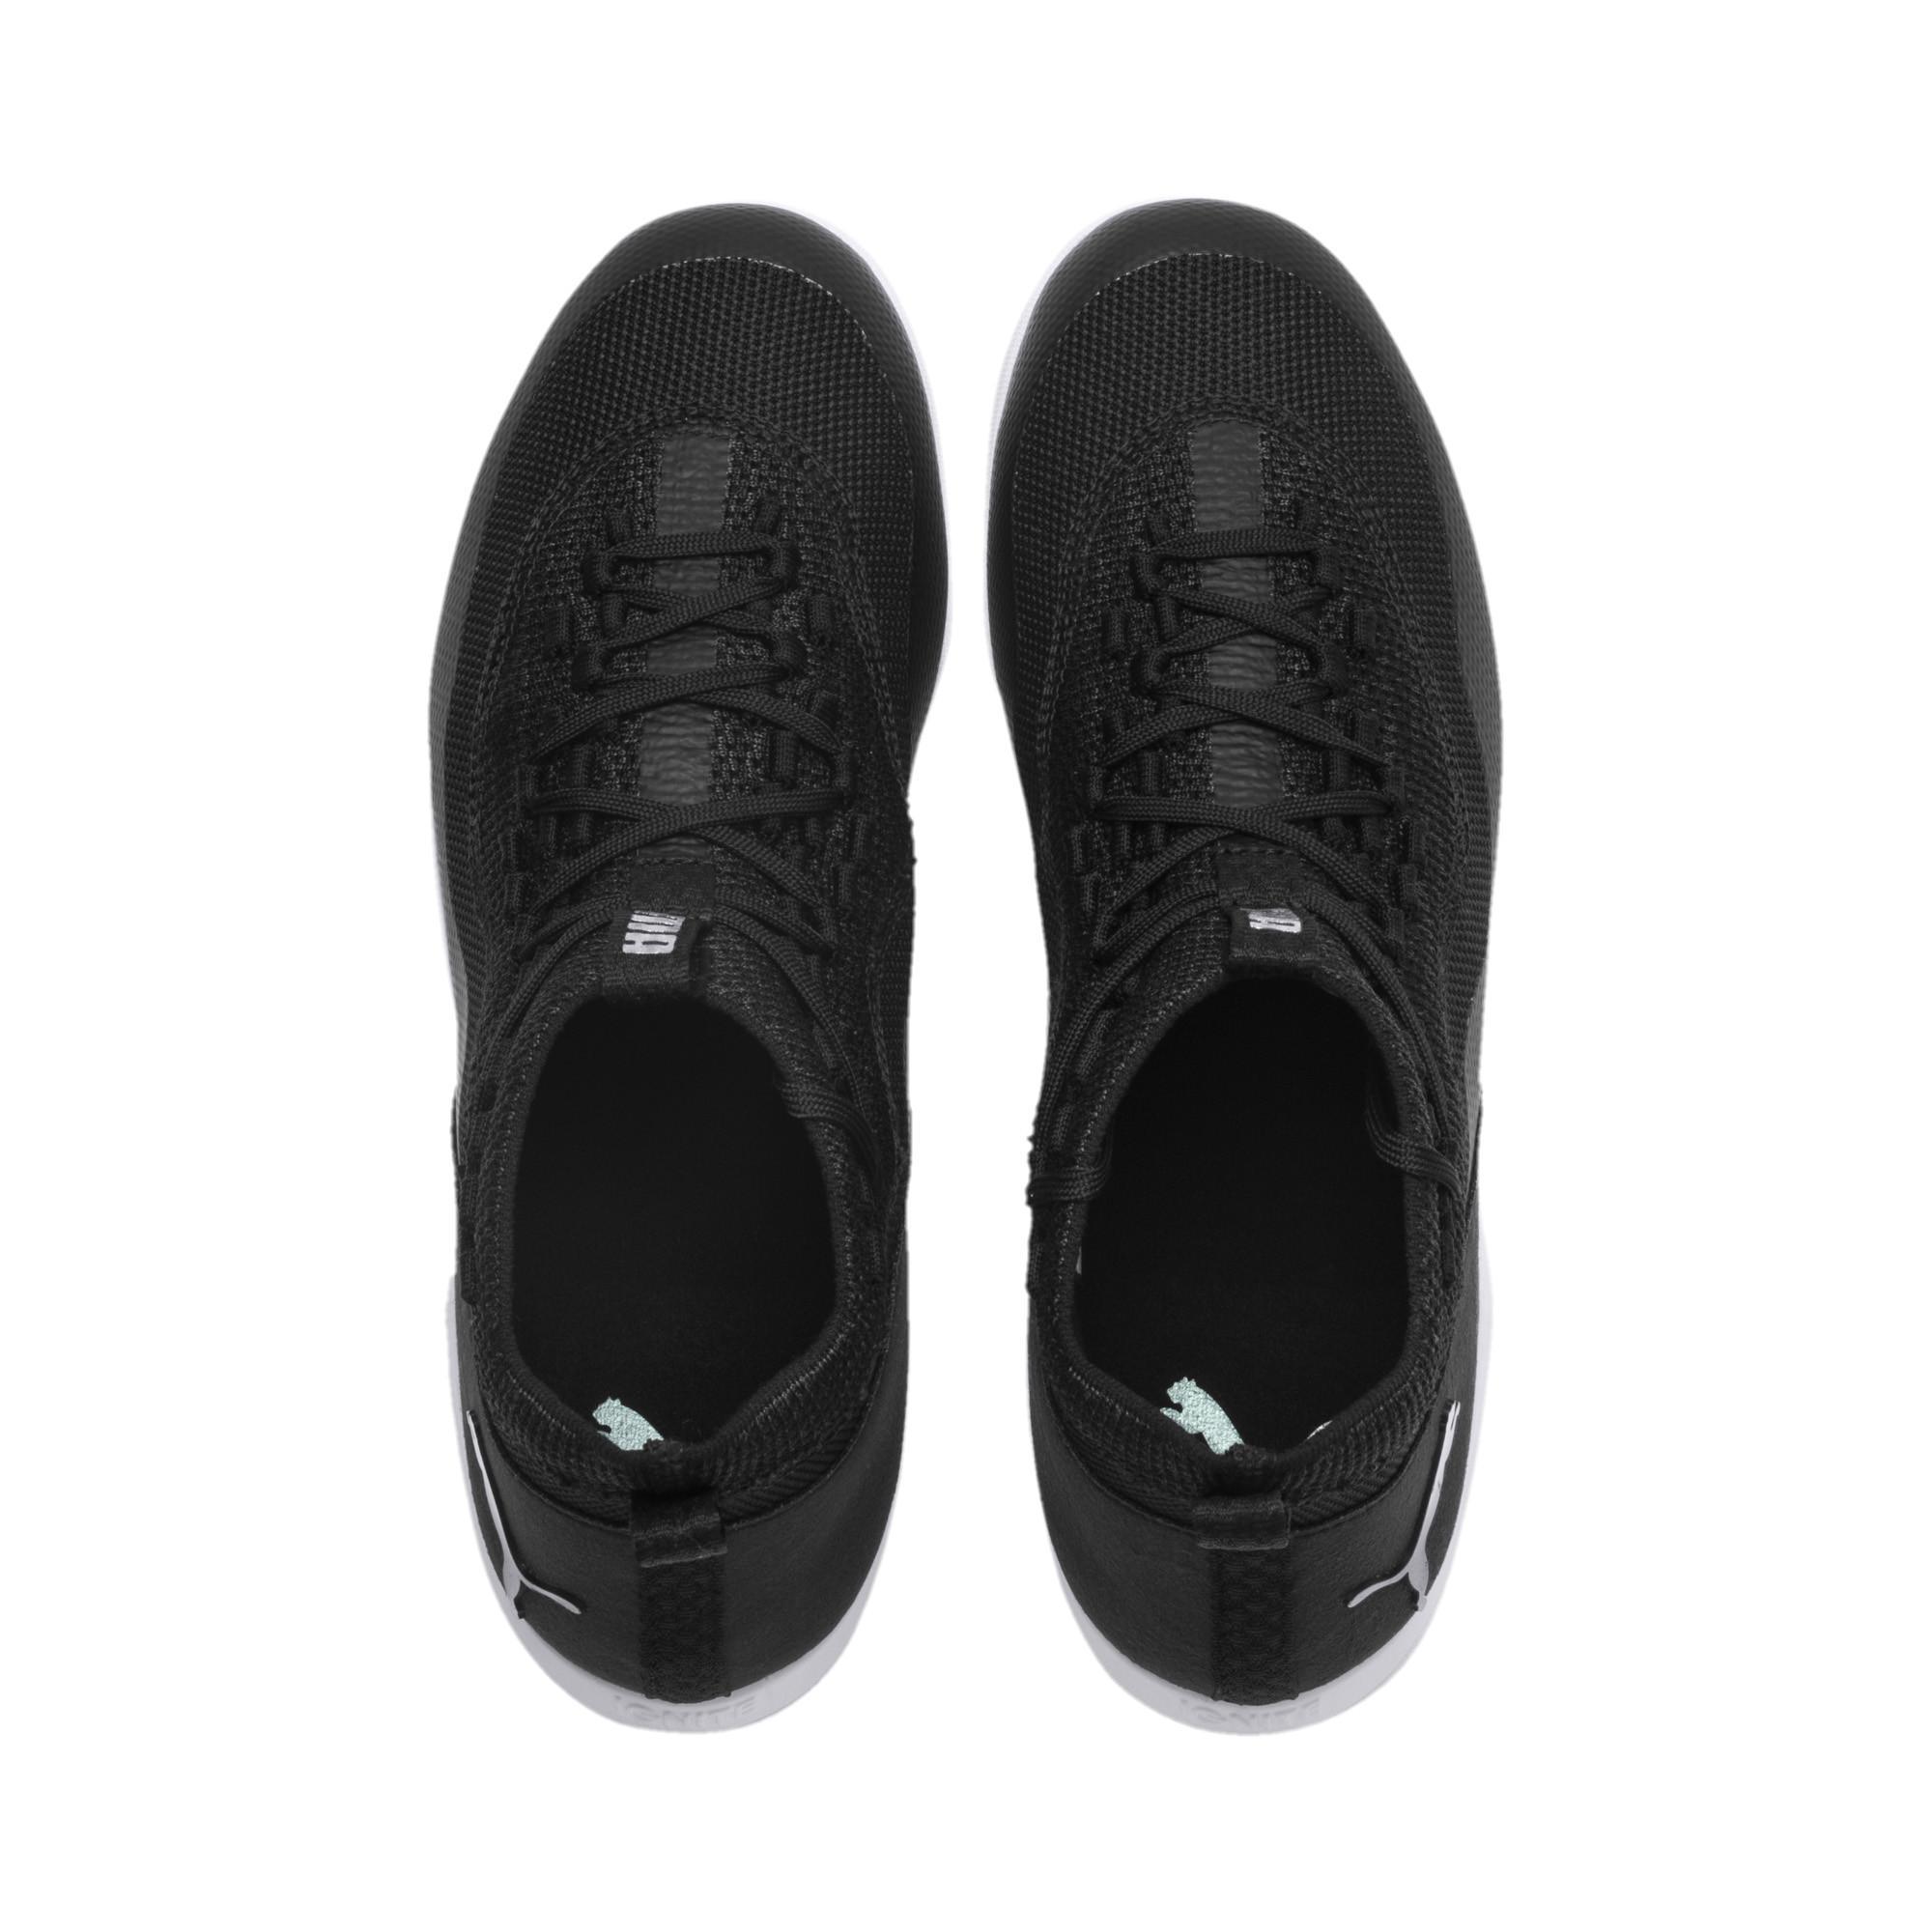 Lyst - PUMA 365 Ignite Fuse E1 Men s Soccer Shoes in Black for Men 88134038d